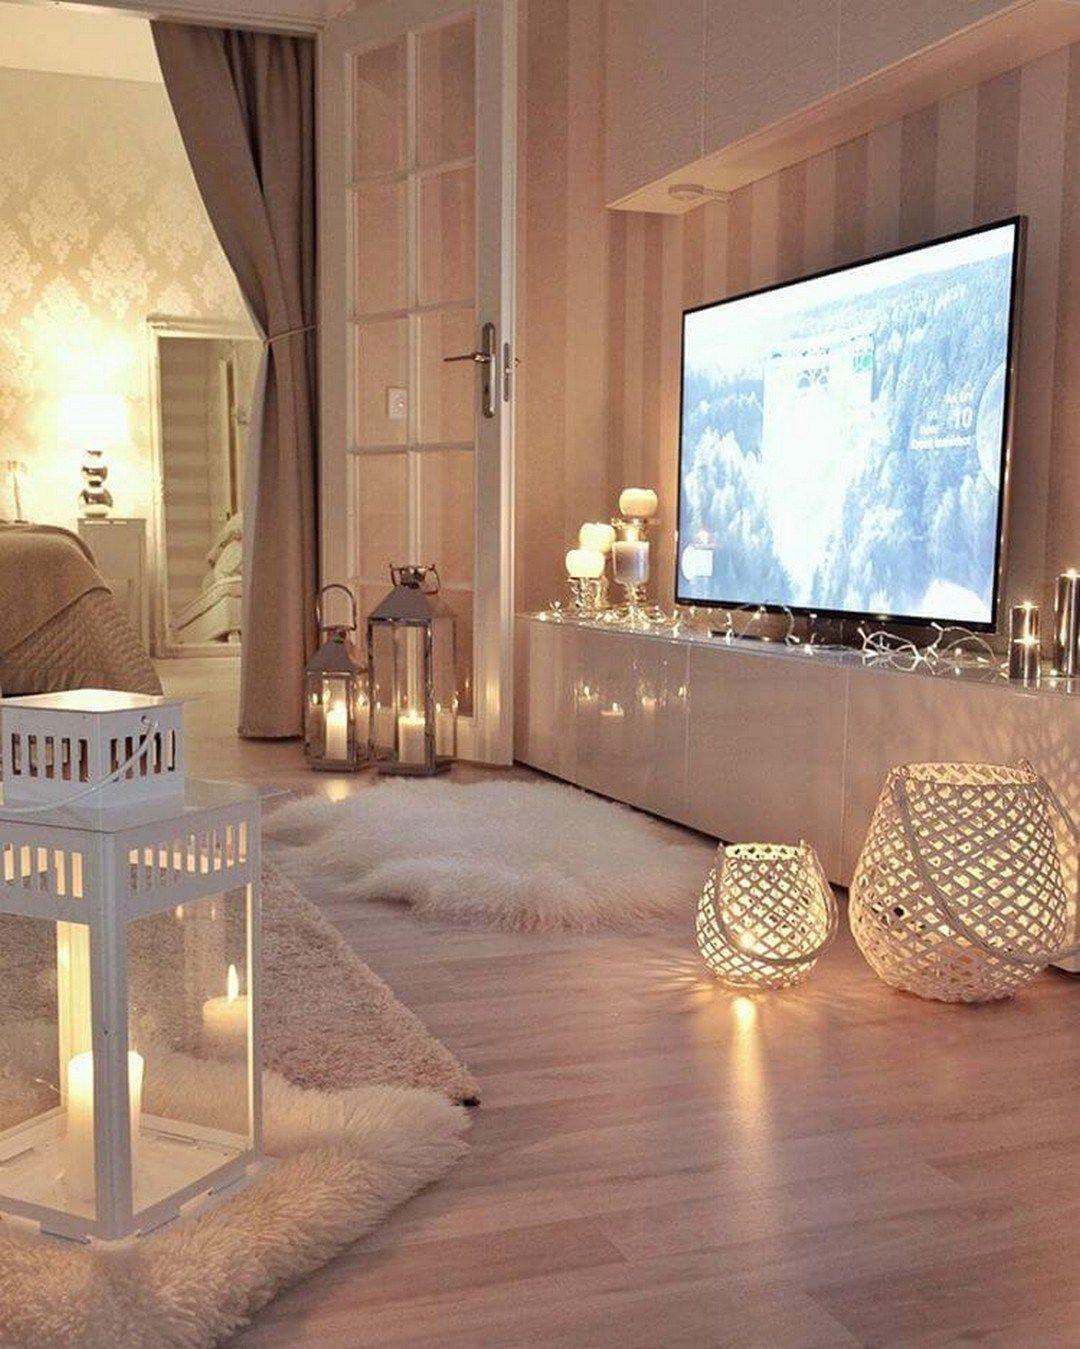 charming living room set ups   23 Charming Beige Living Room Design Ideas To Brighten Up ...